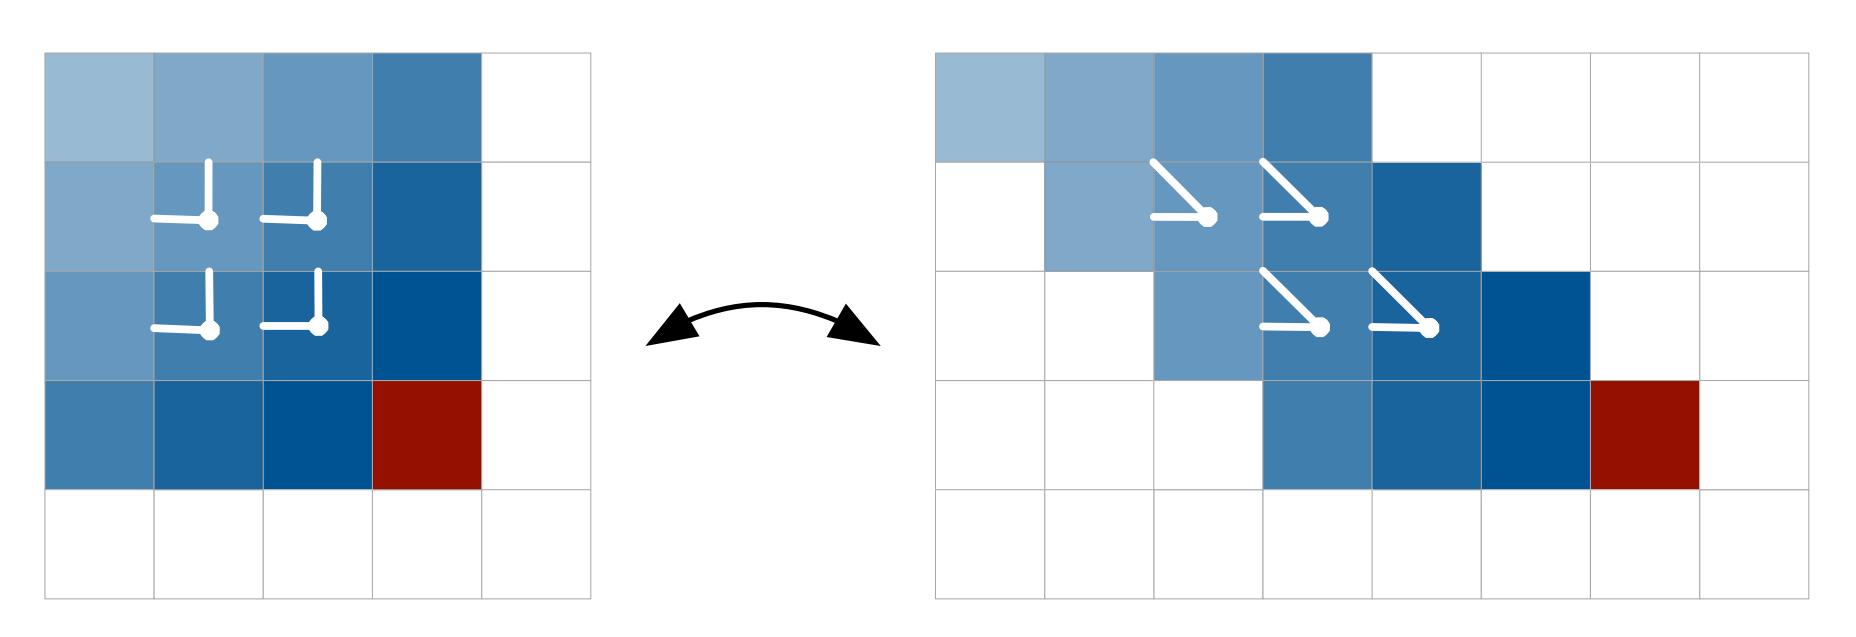 The Diagonal BiLSTM